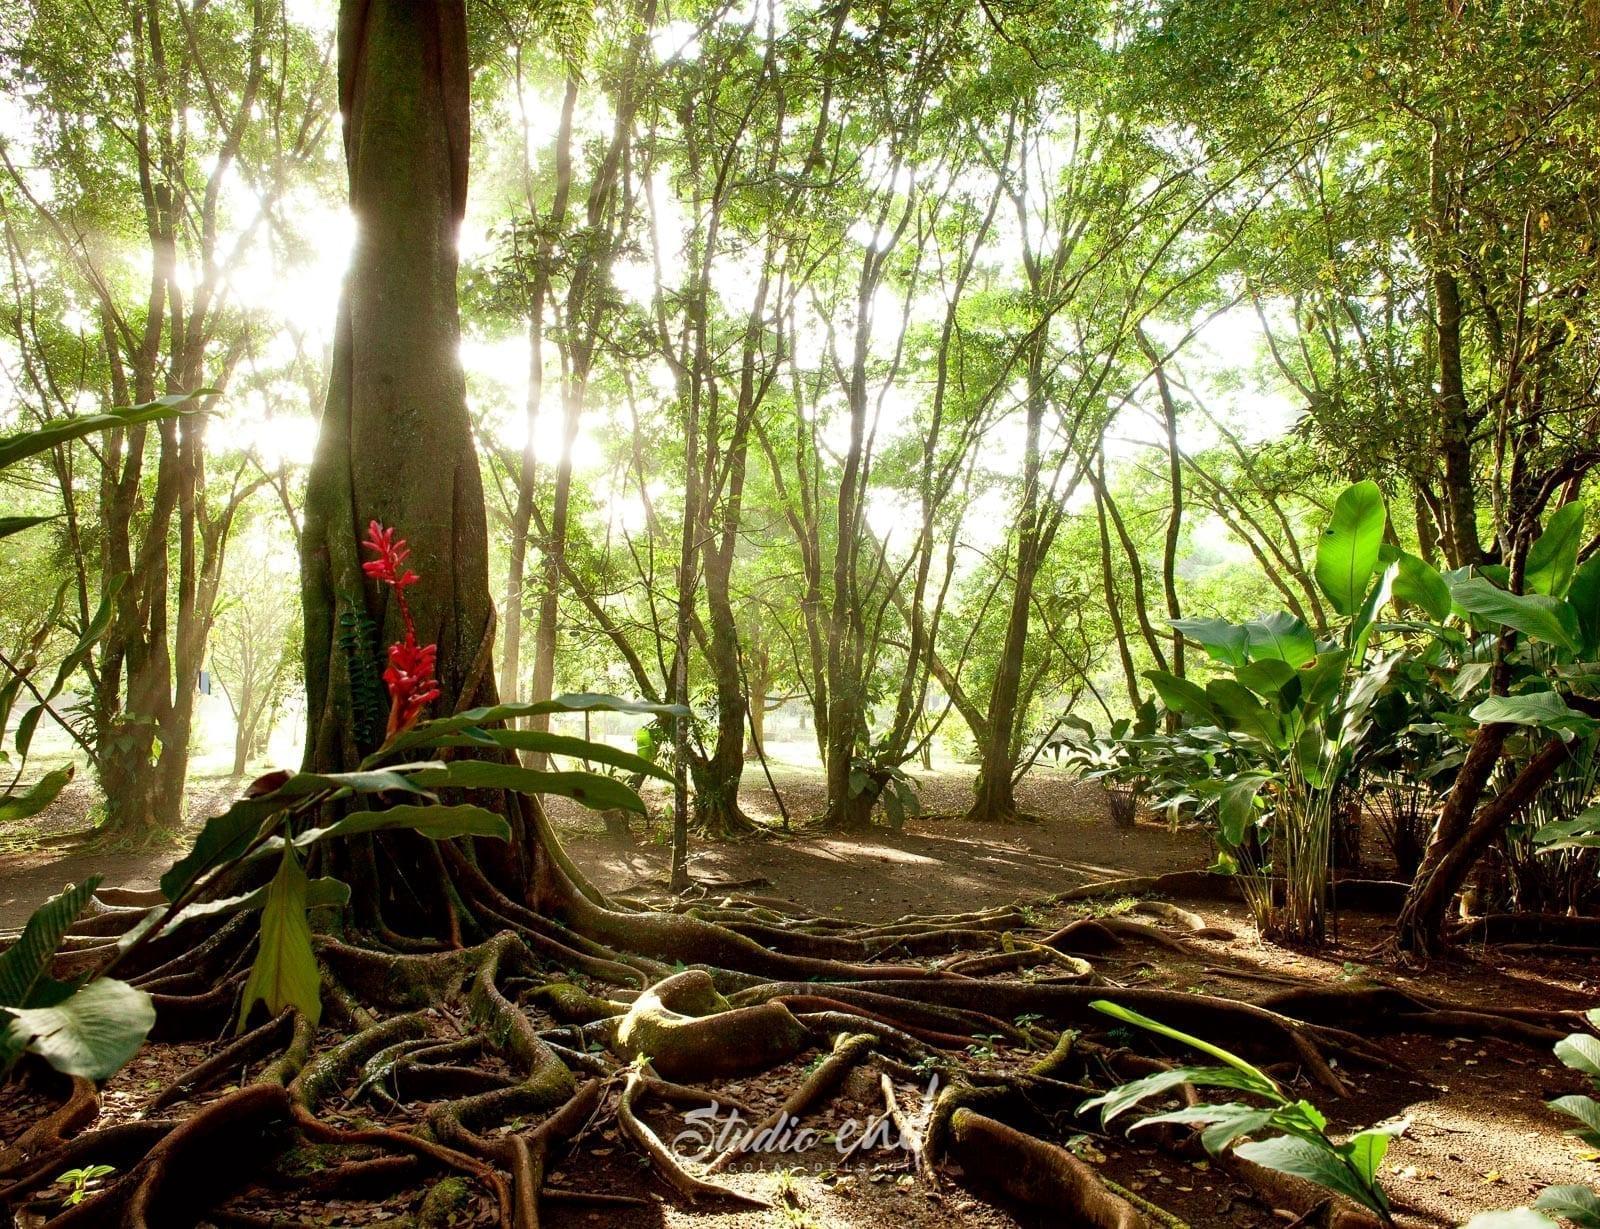 Photographie et reportage de voyage arbre tropical Costa Rica Nicolas Delsaut